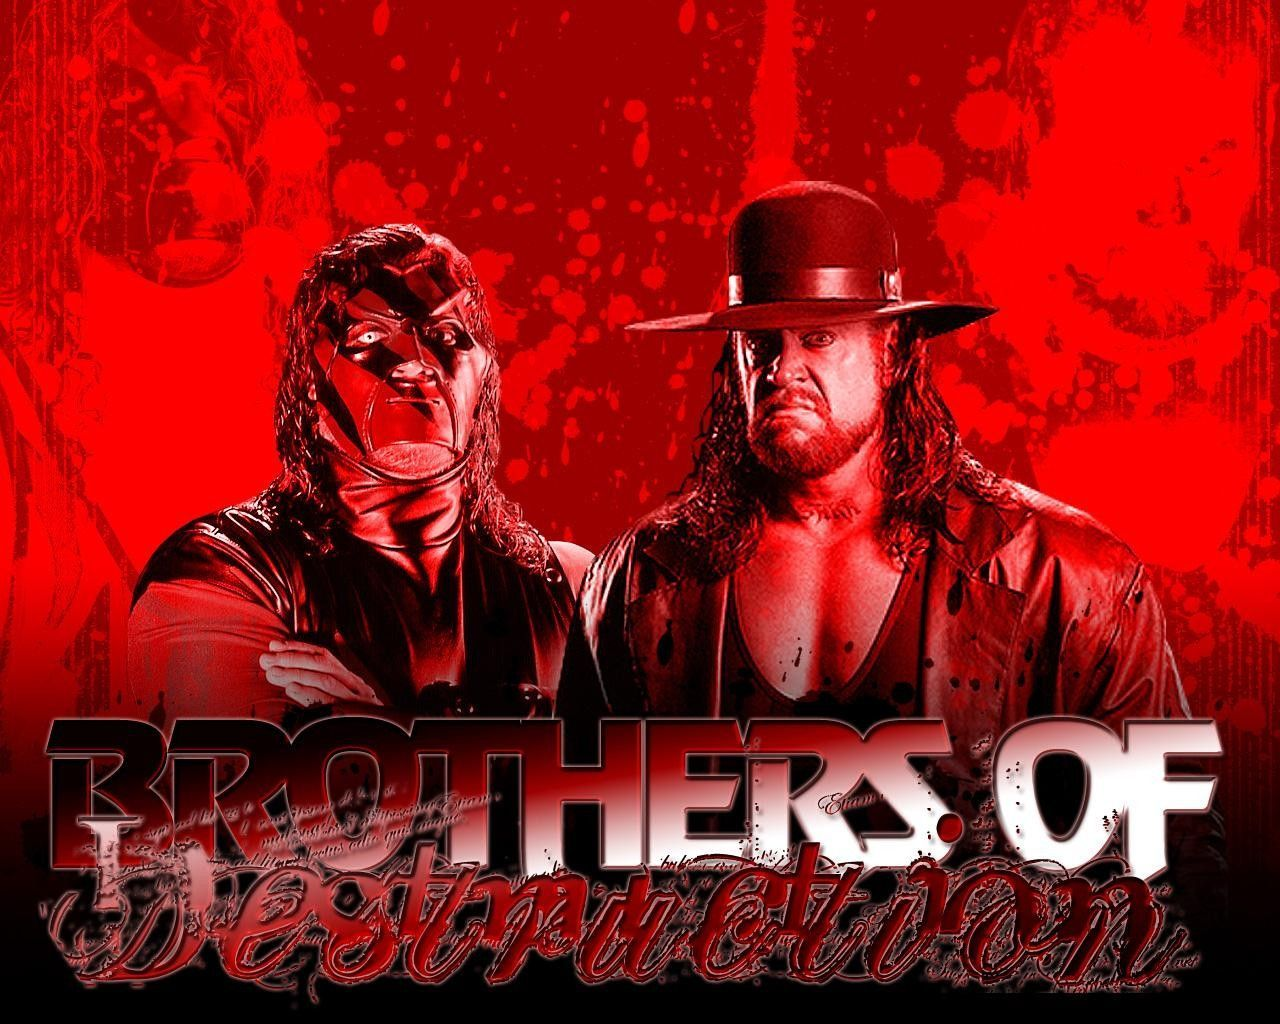 undertaker pictures 2015